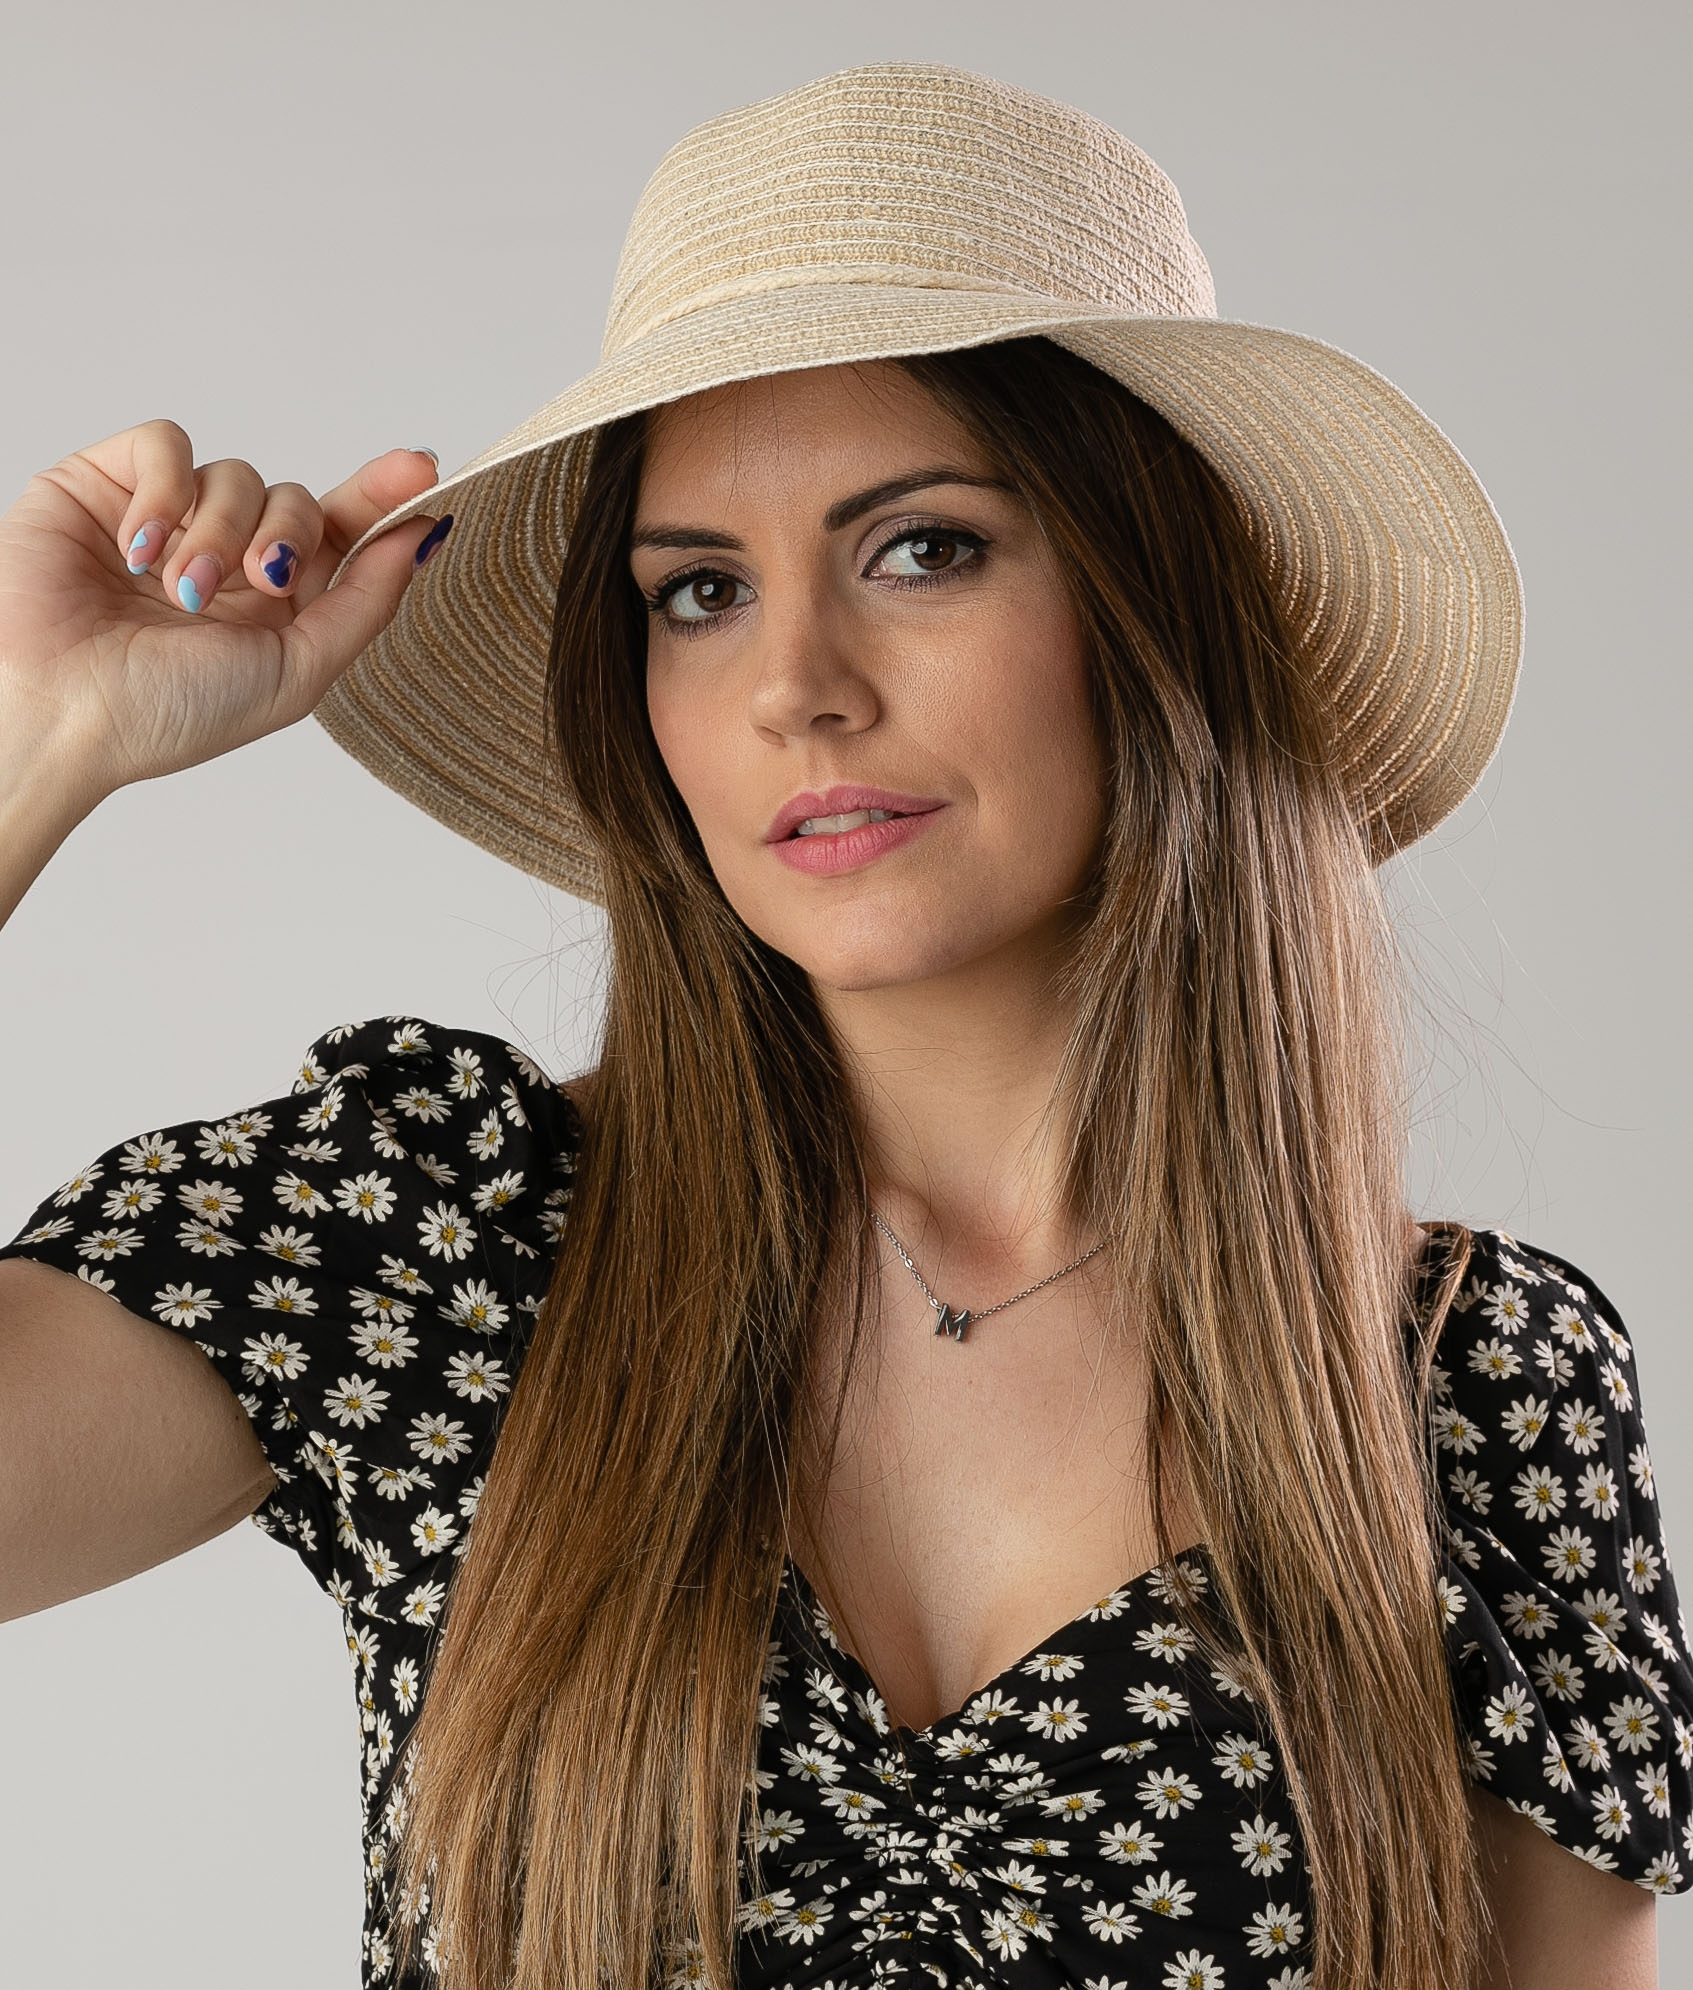 Pamela Leticia - natural